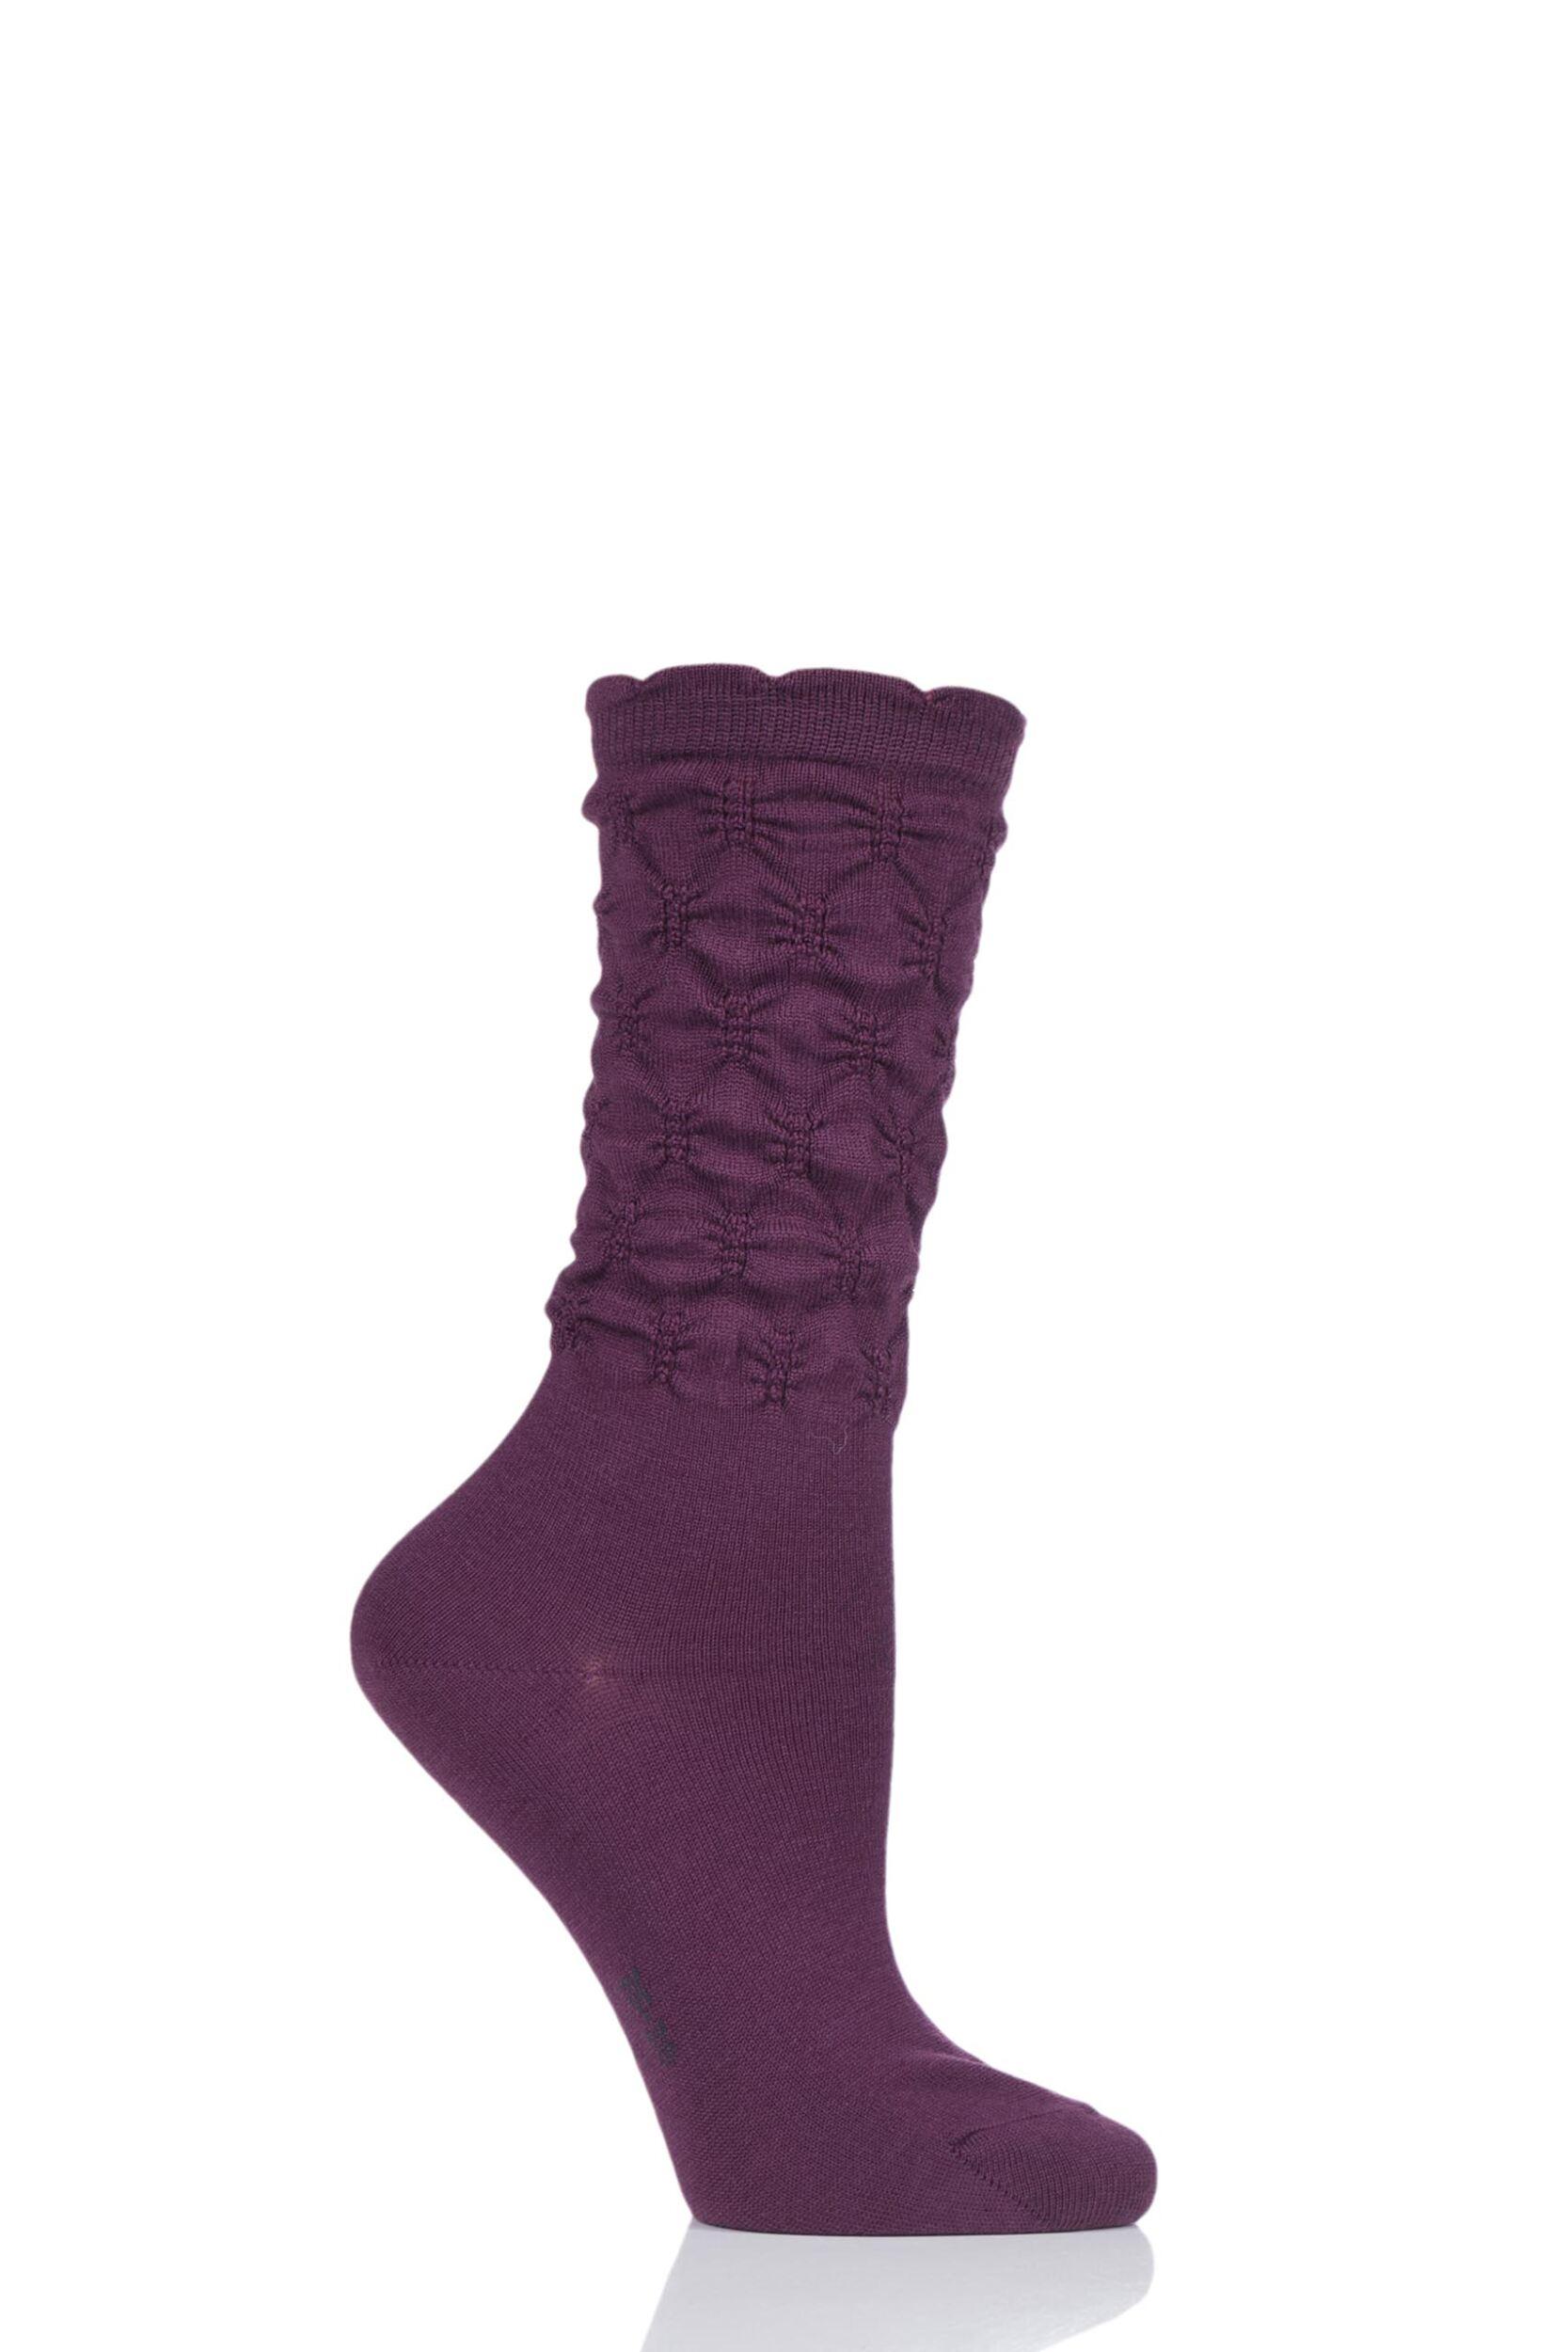 1 pair purple crumpled diamond rib virgin wool socks ladies 2.5-5 ladies - falke